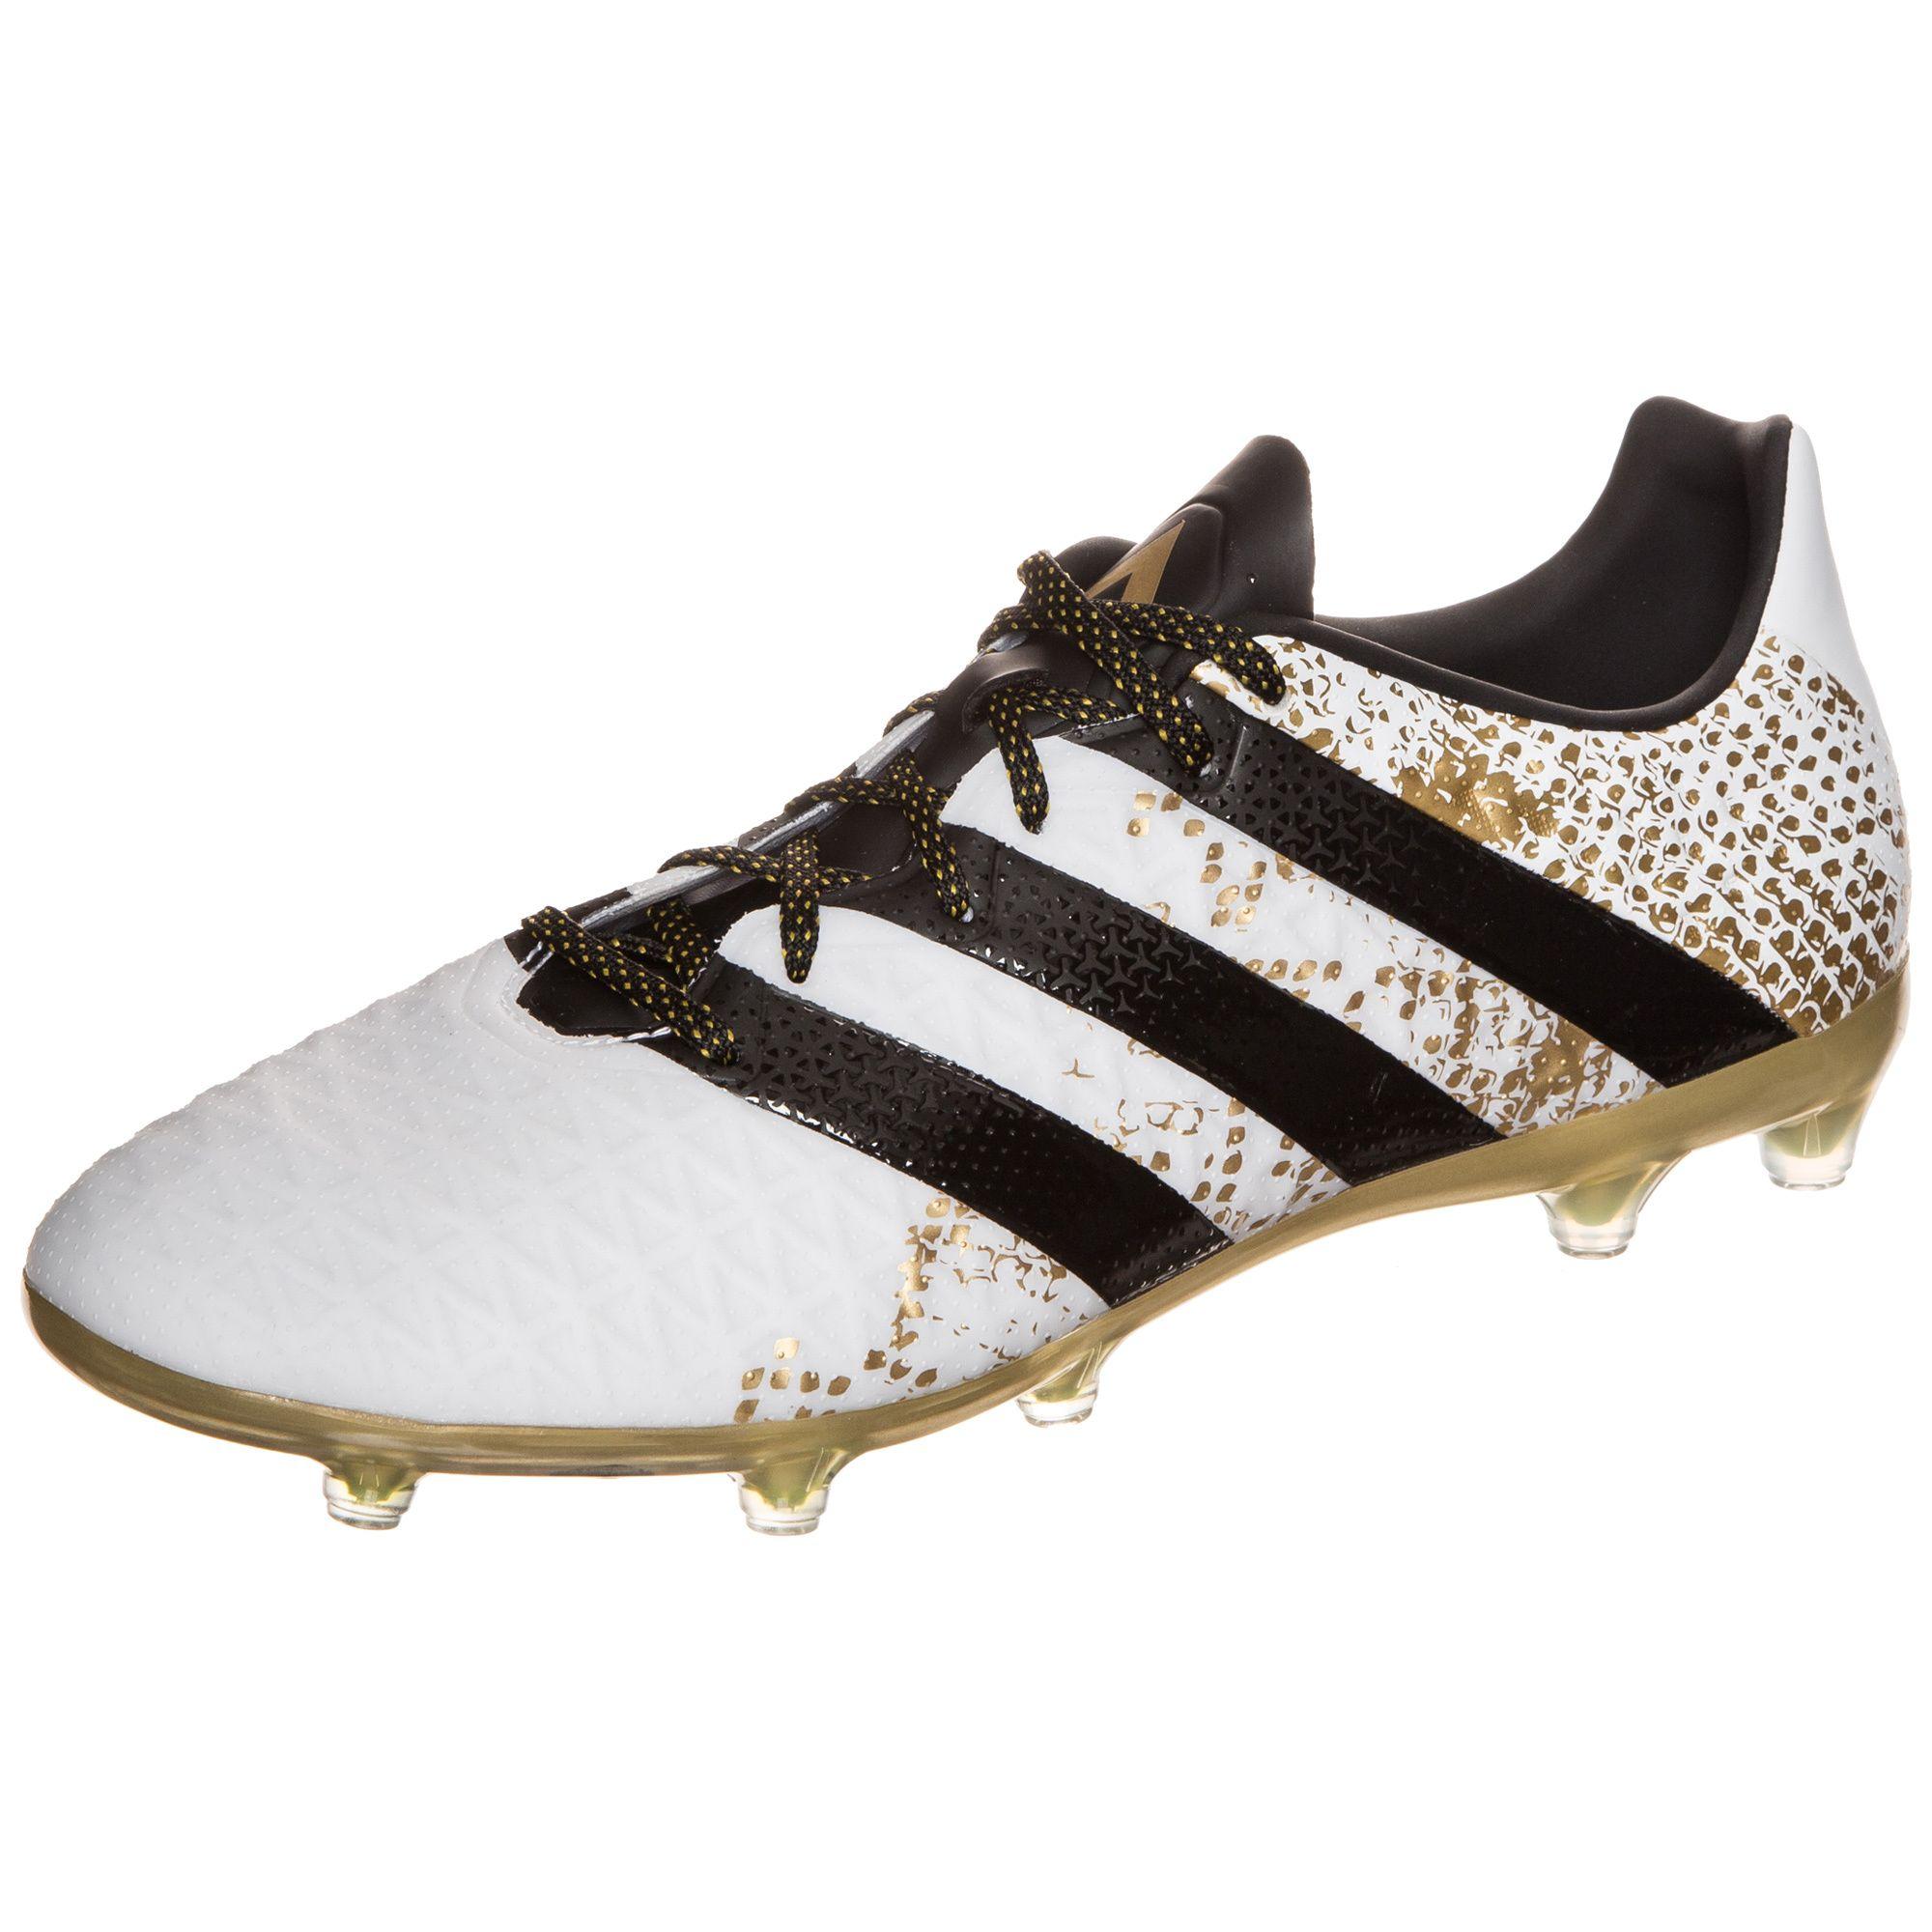 ADIDAS PERFORMANCE adidas Performance ACE 16.2 FG Fußballschuh Herren